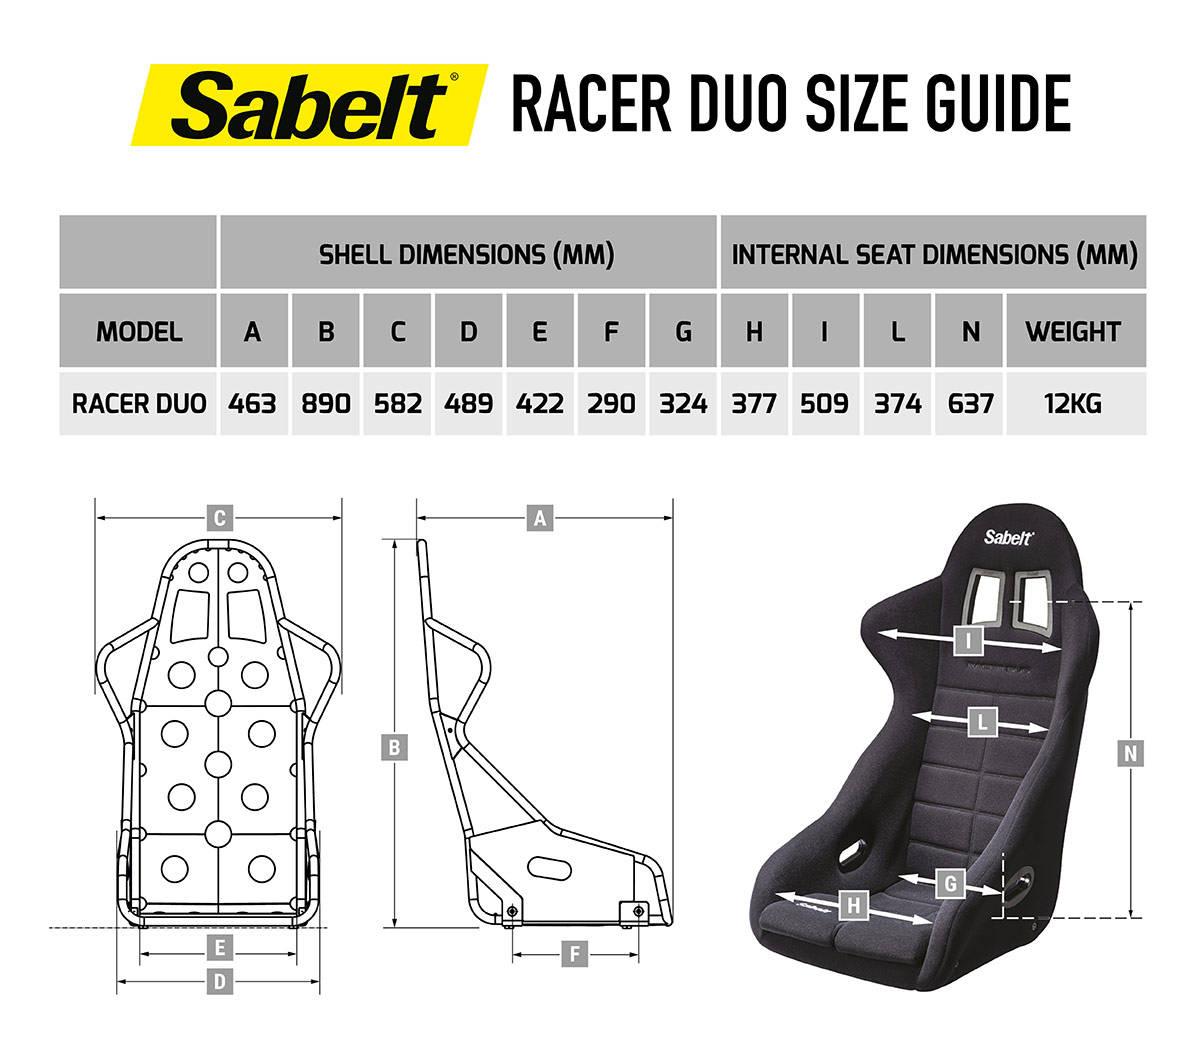 sabelt-racer-duo-sizeguide.jpg